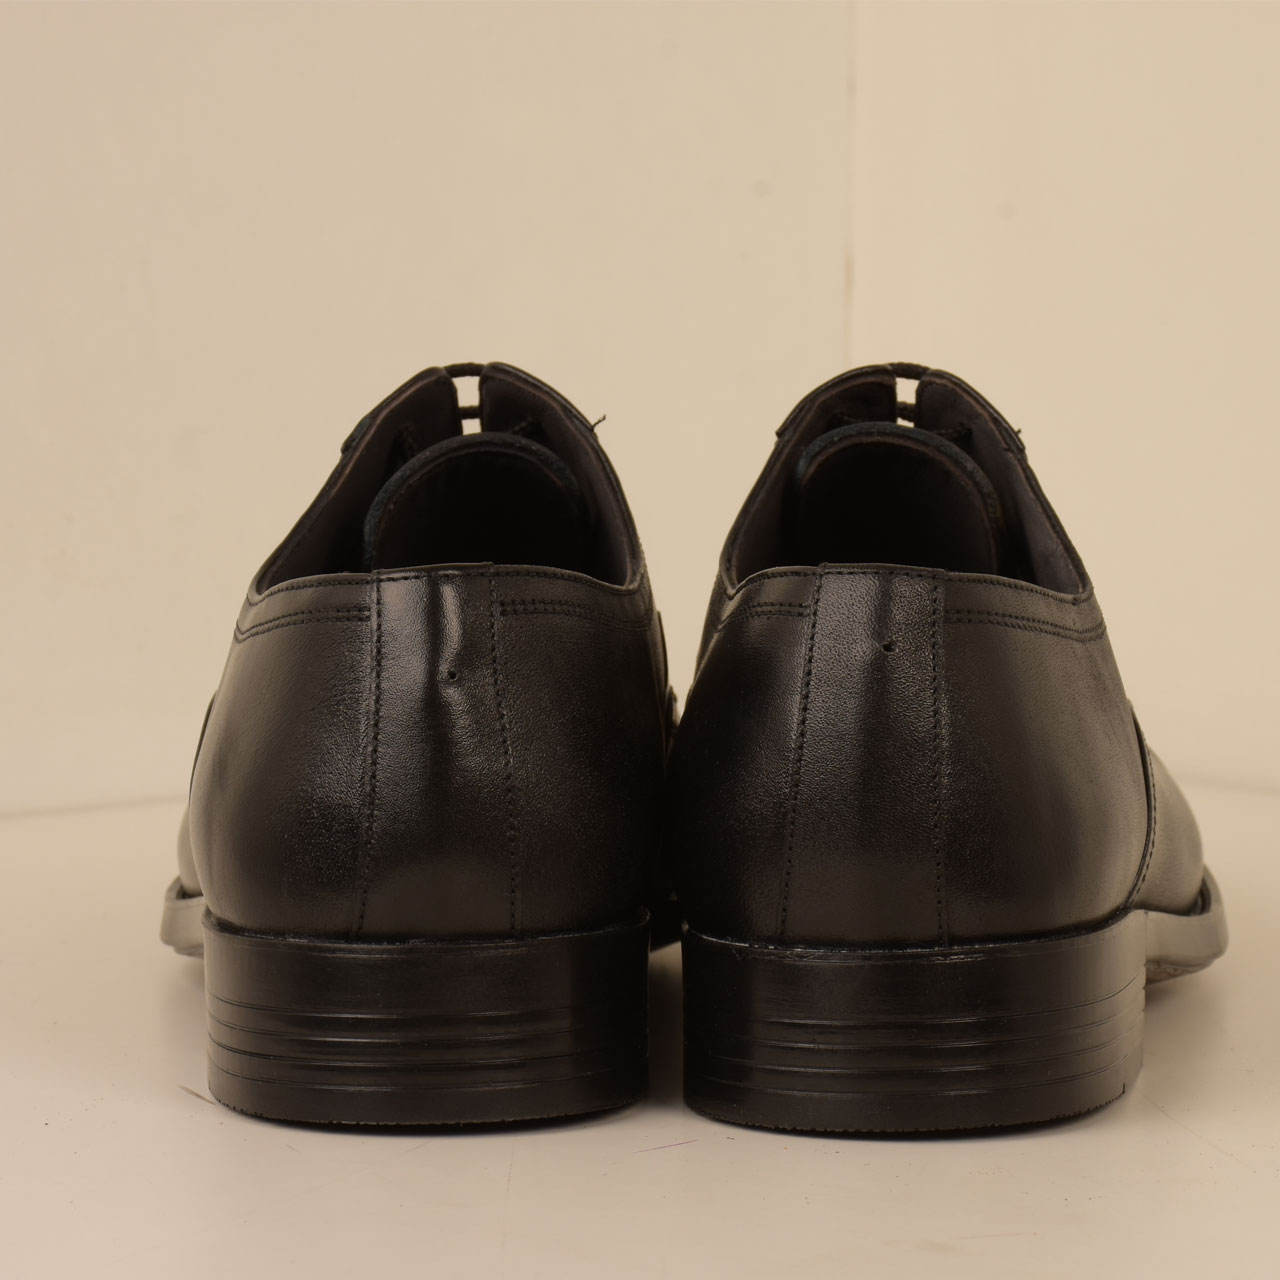 کفش مردانه پارینه چرم مدل SHO178 -  - 3